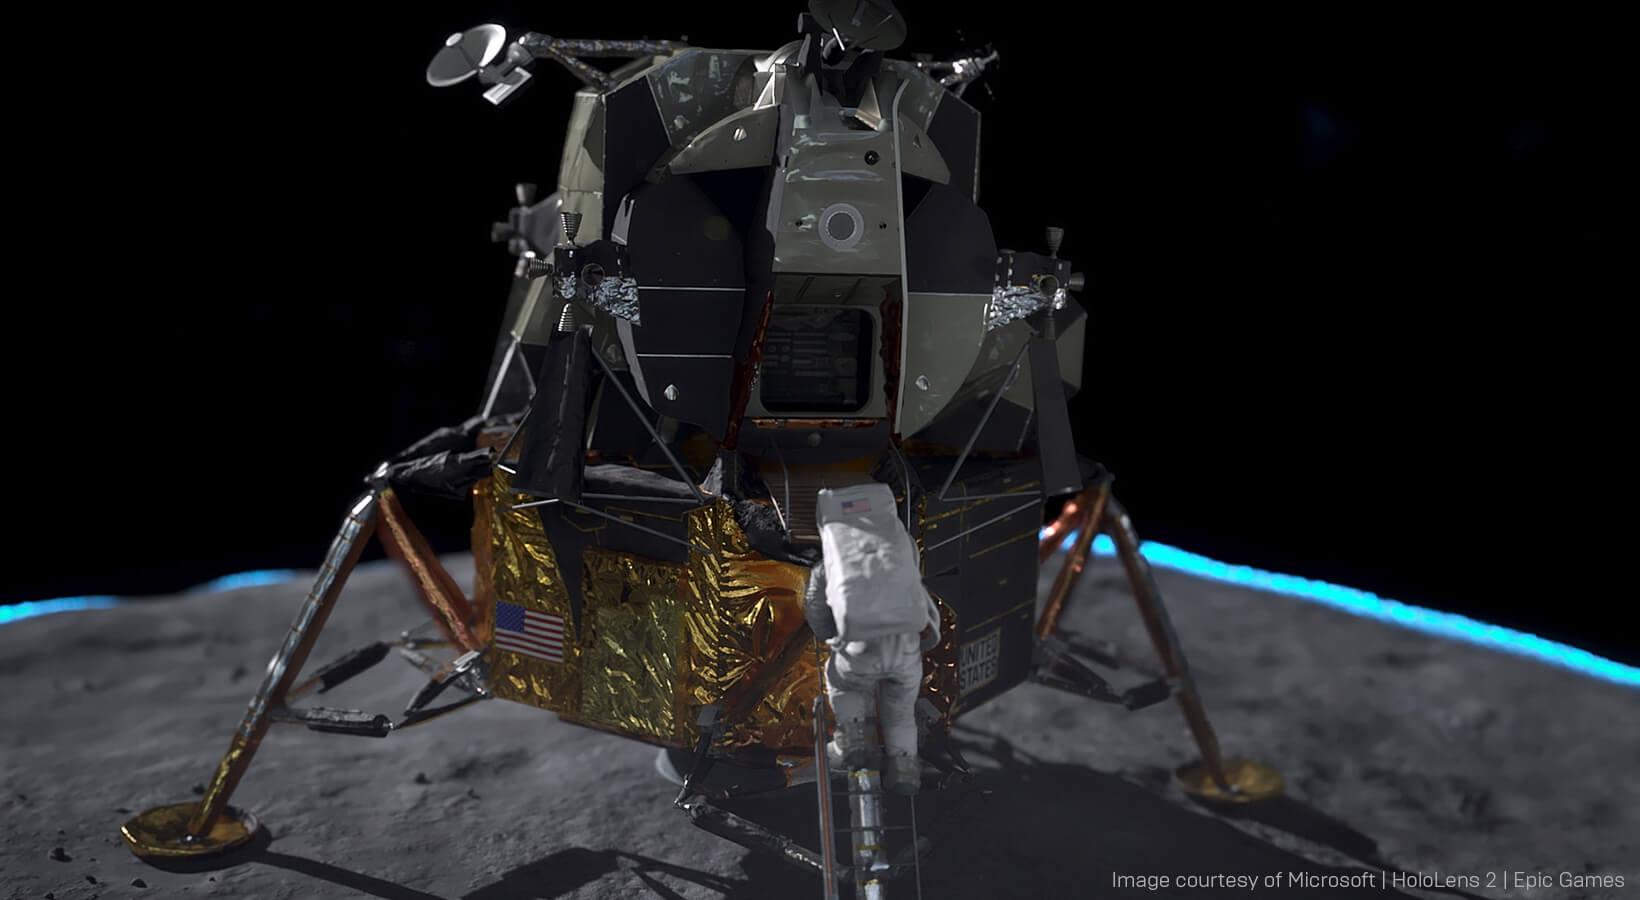 Spotlight_Apollo11_HololensBlog_Body_Image_6.jpg